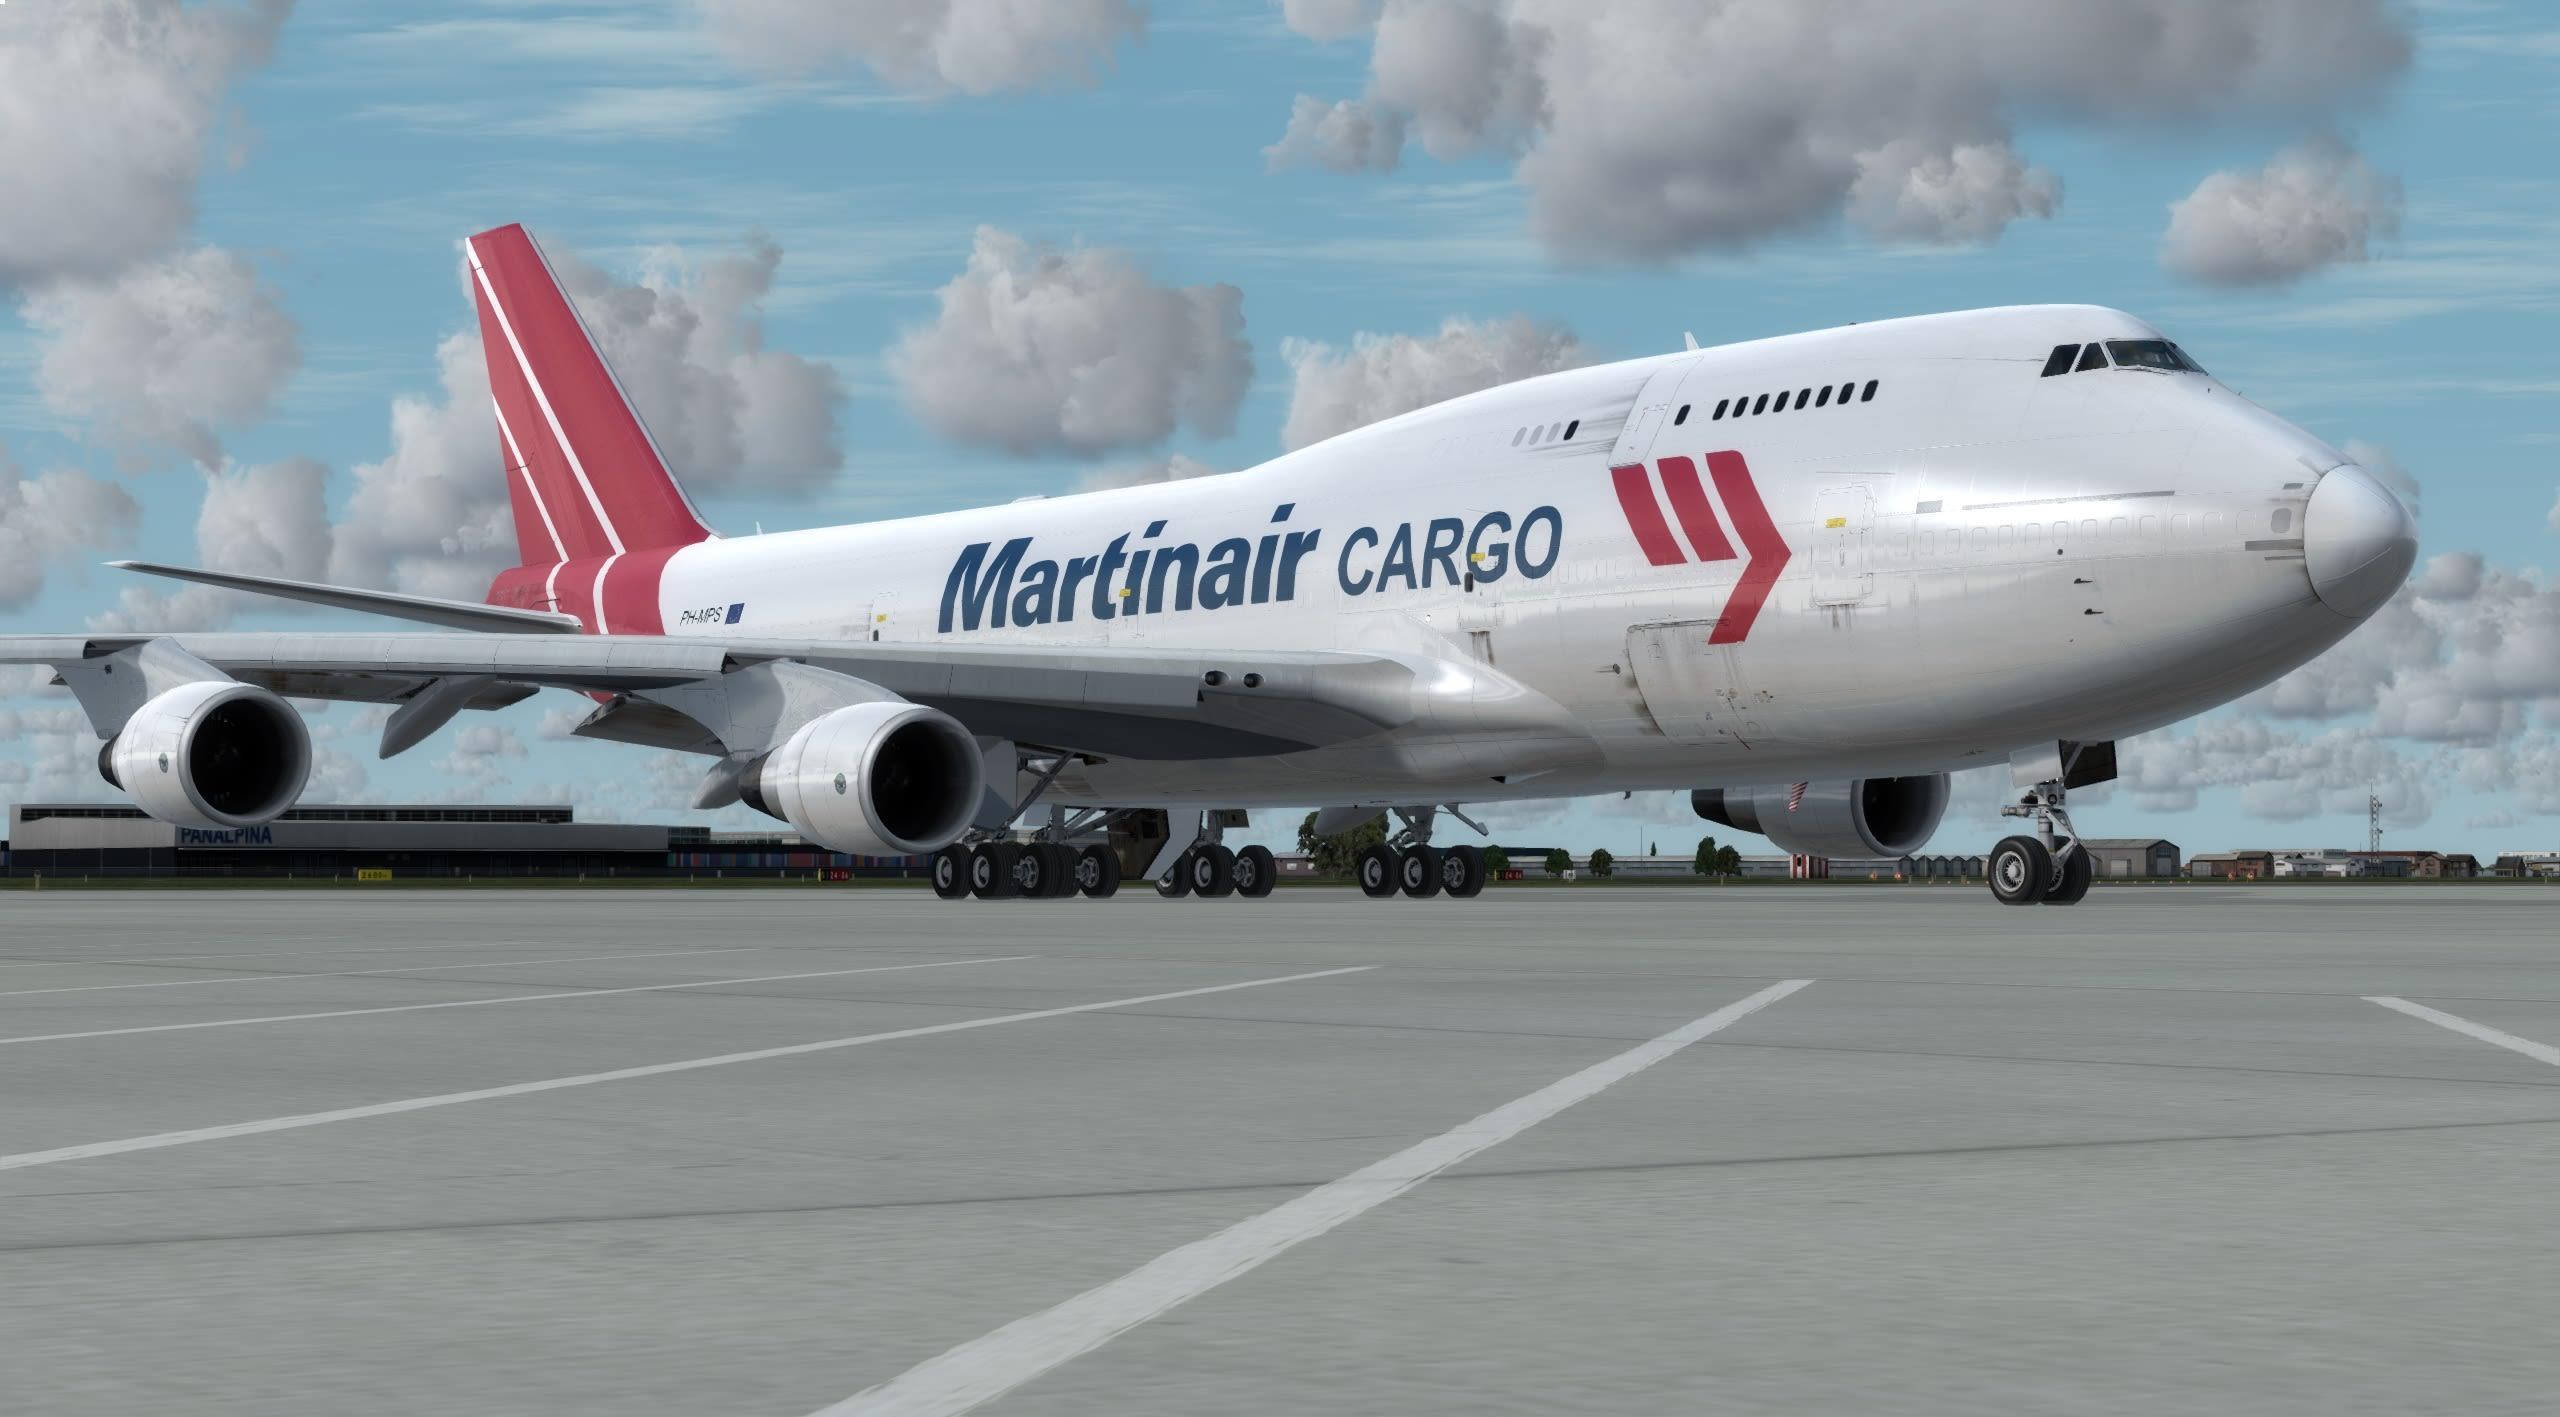 Boeing 747-400BCF